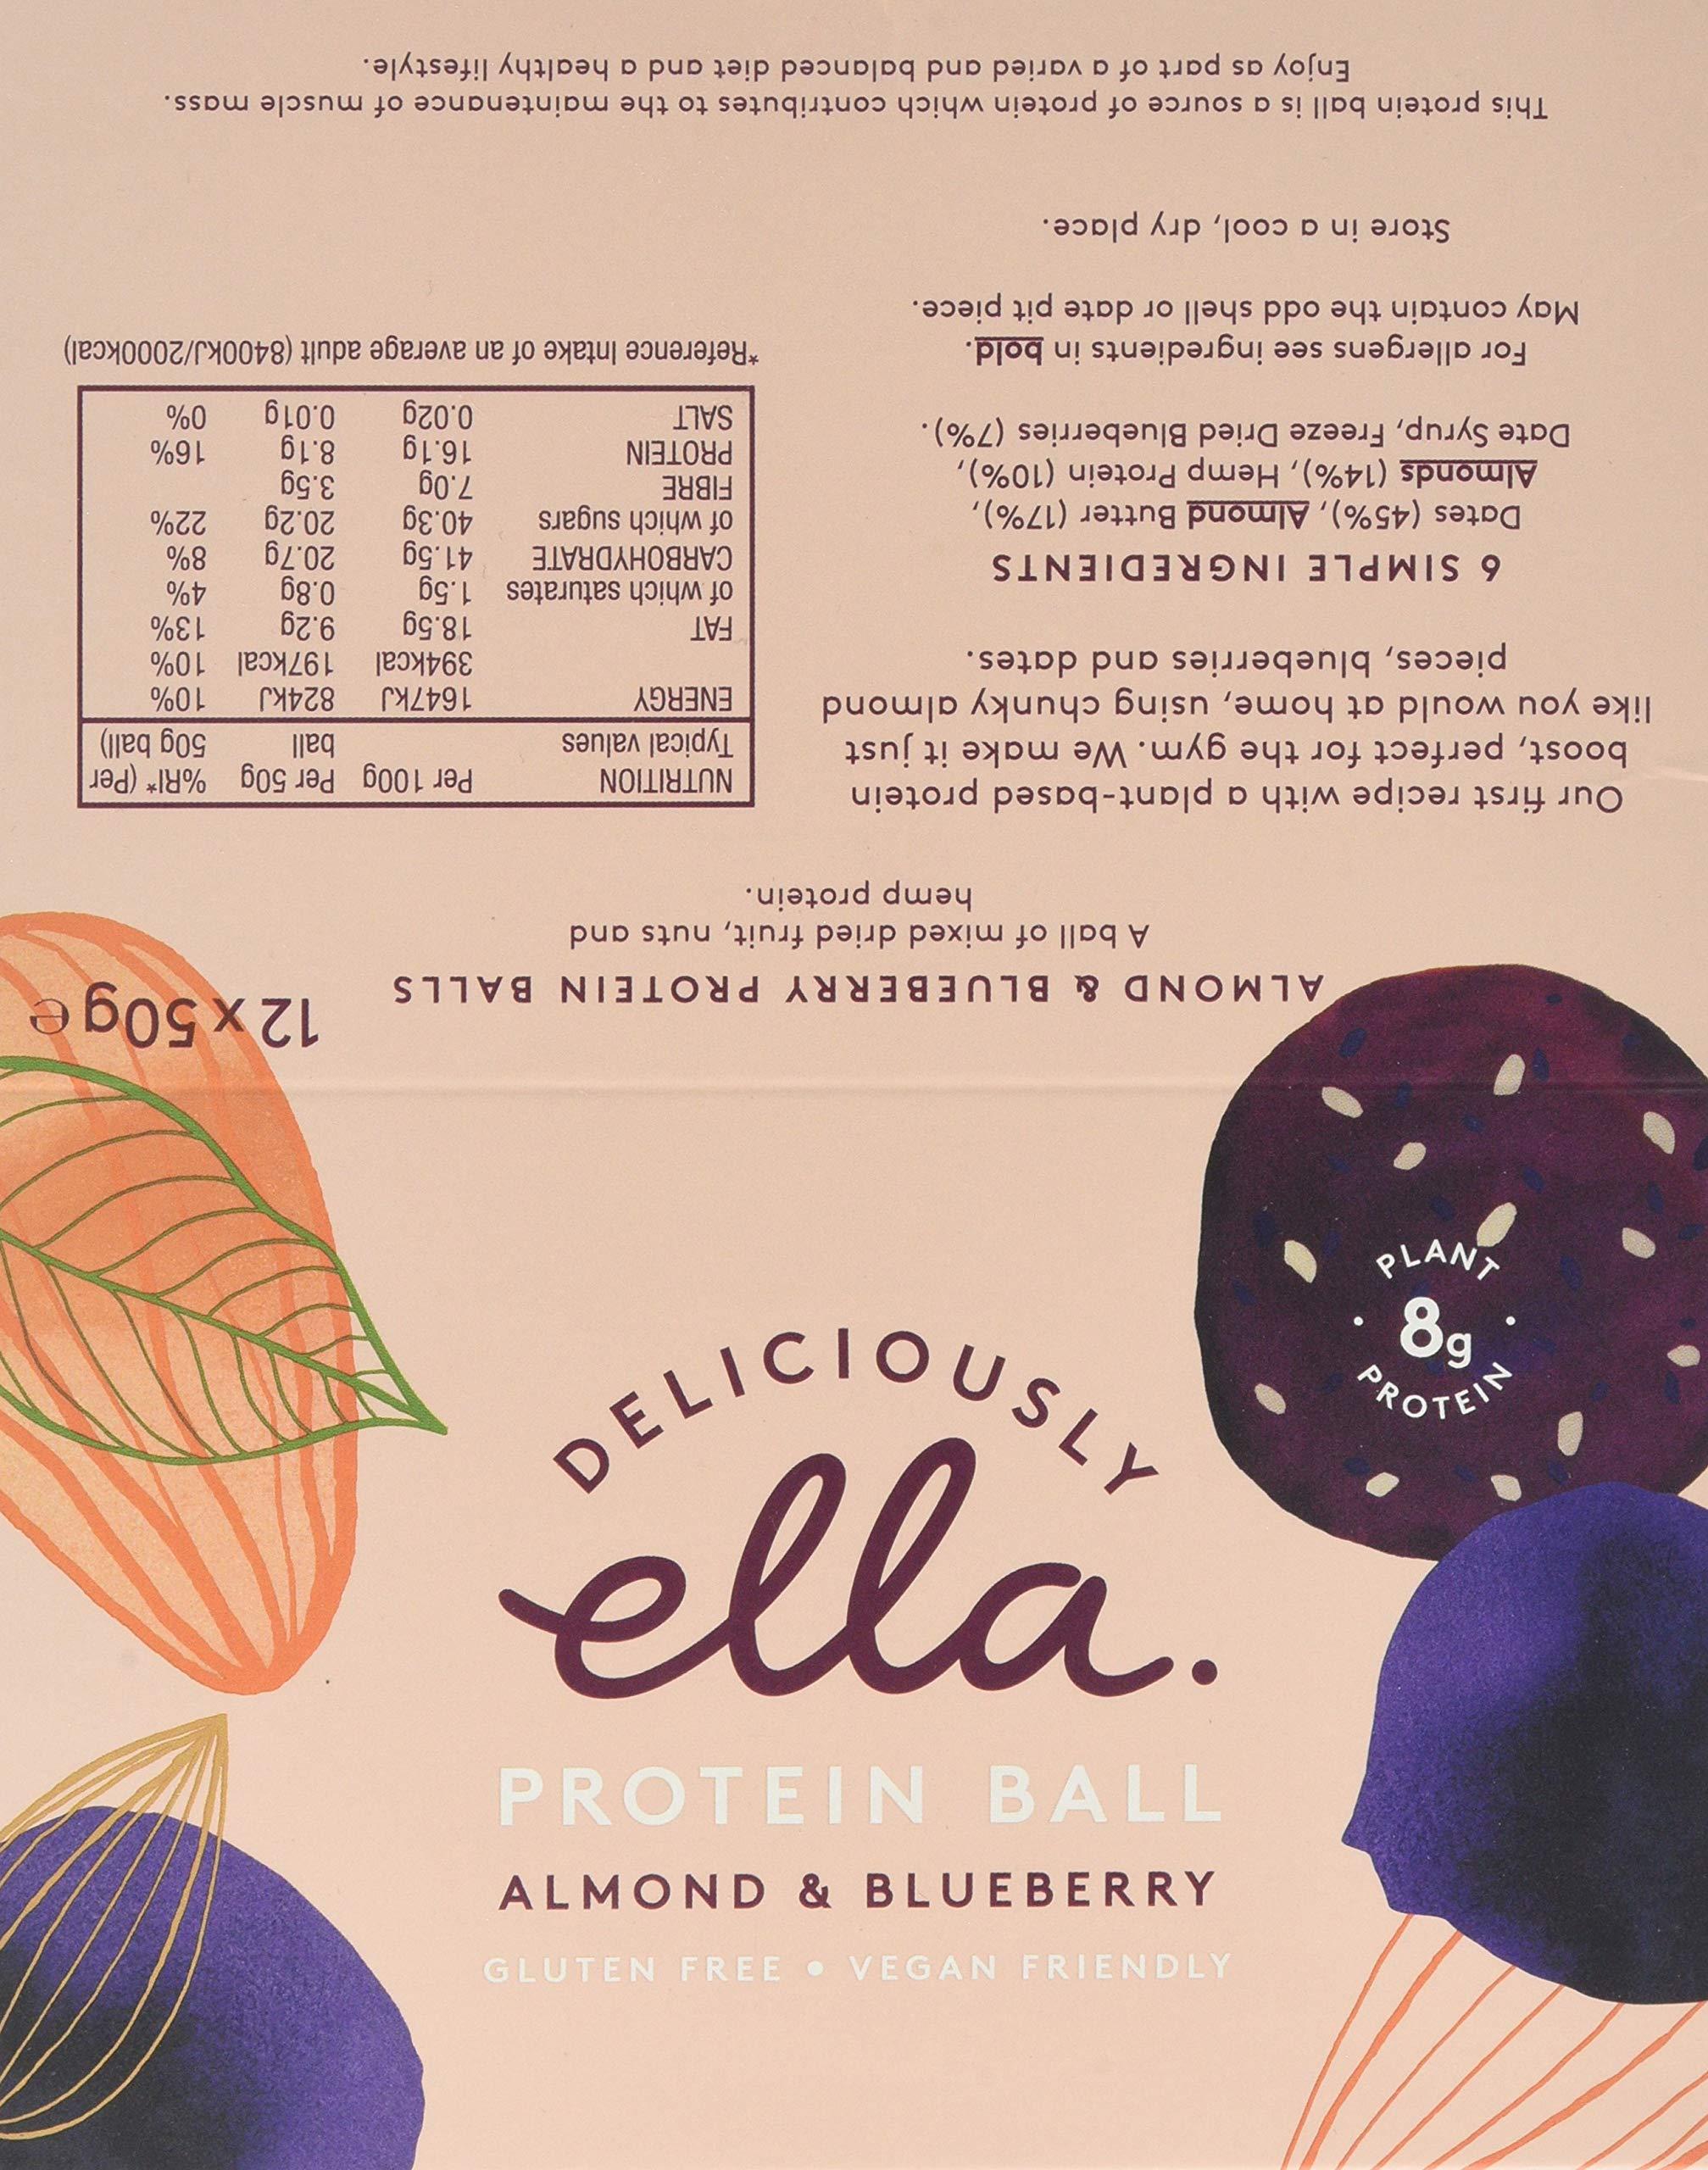 Deliciously Ella - Almond & Blueberry Protein Ball, Gluten-Free, Vegan Friendly, Healthy Snack, 50g (12 Balls) 5